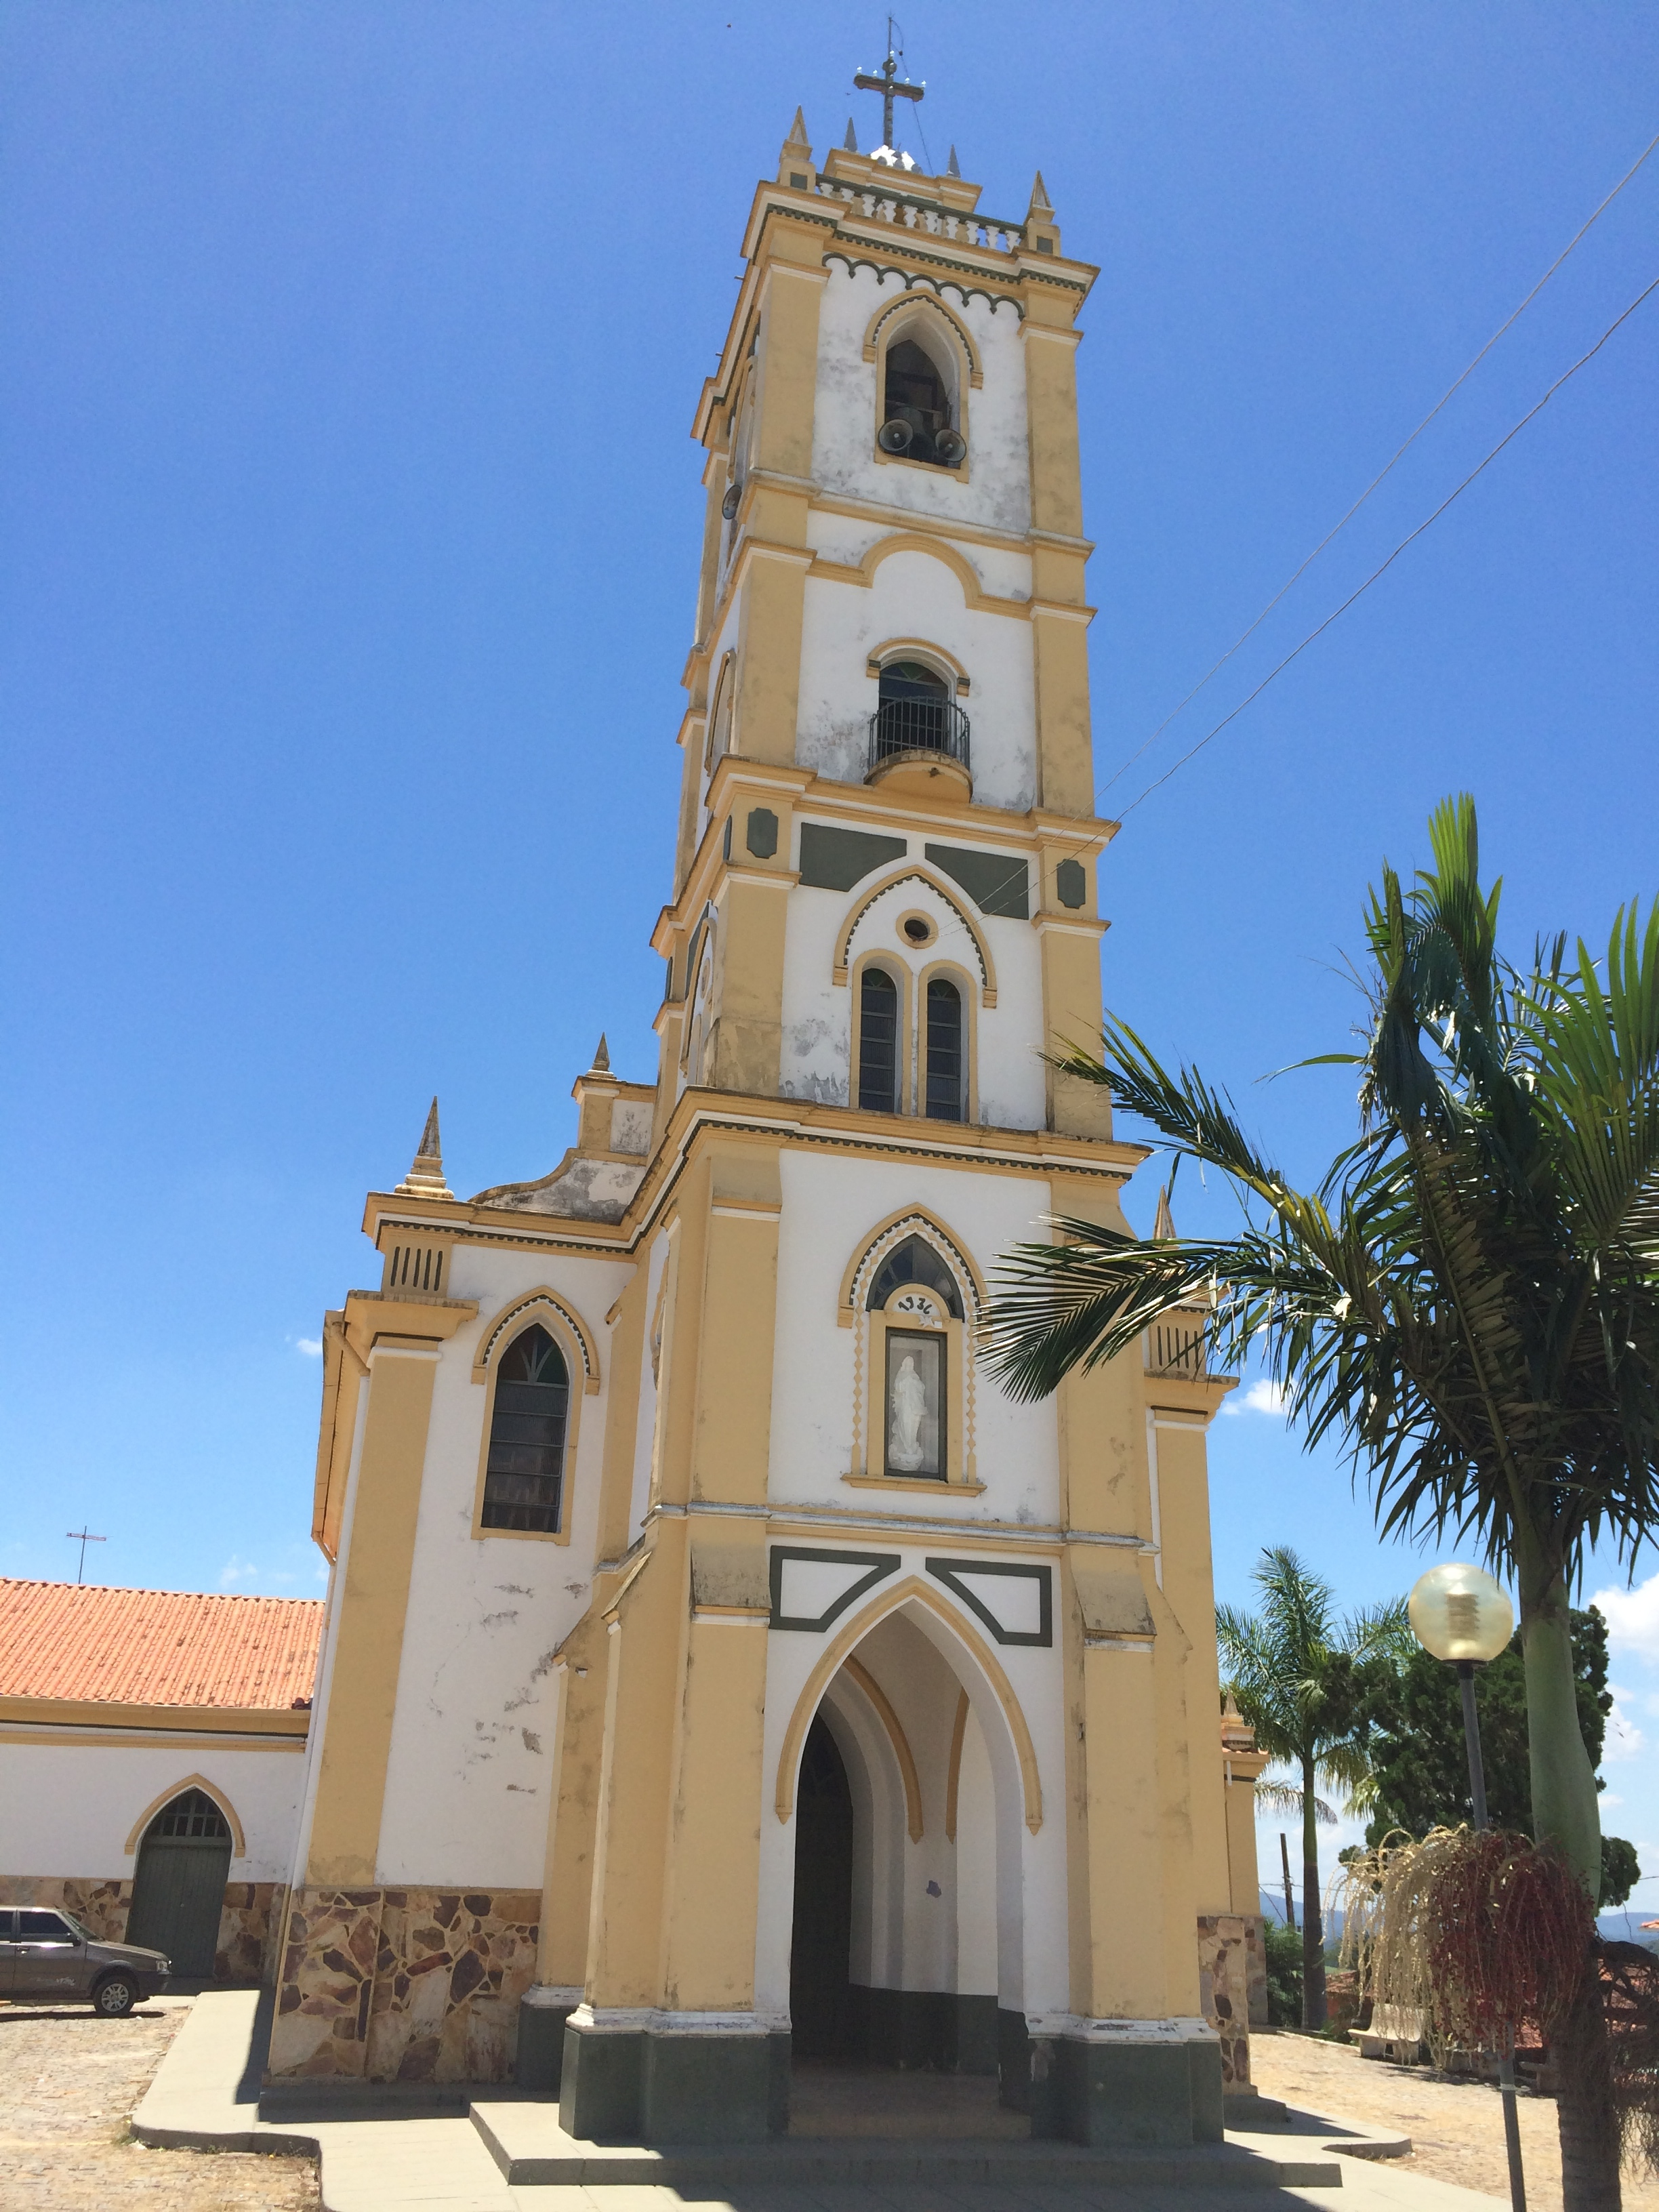 Piracema Minas Gerais fonte: upload.wikimedia.org